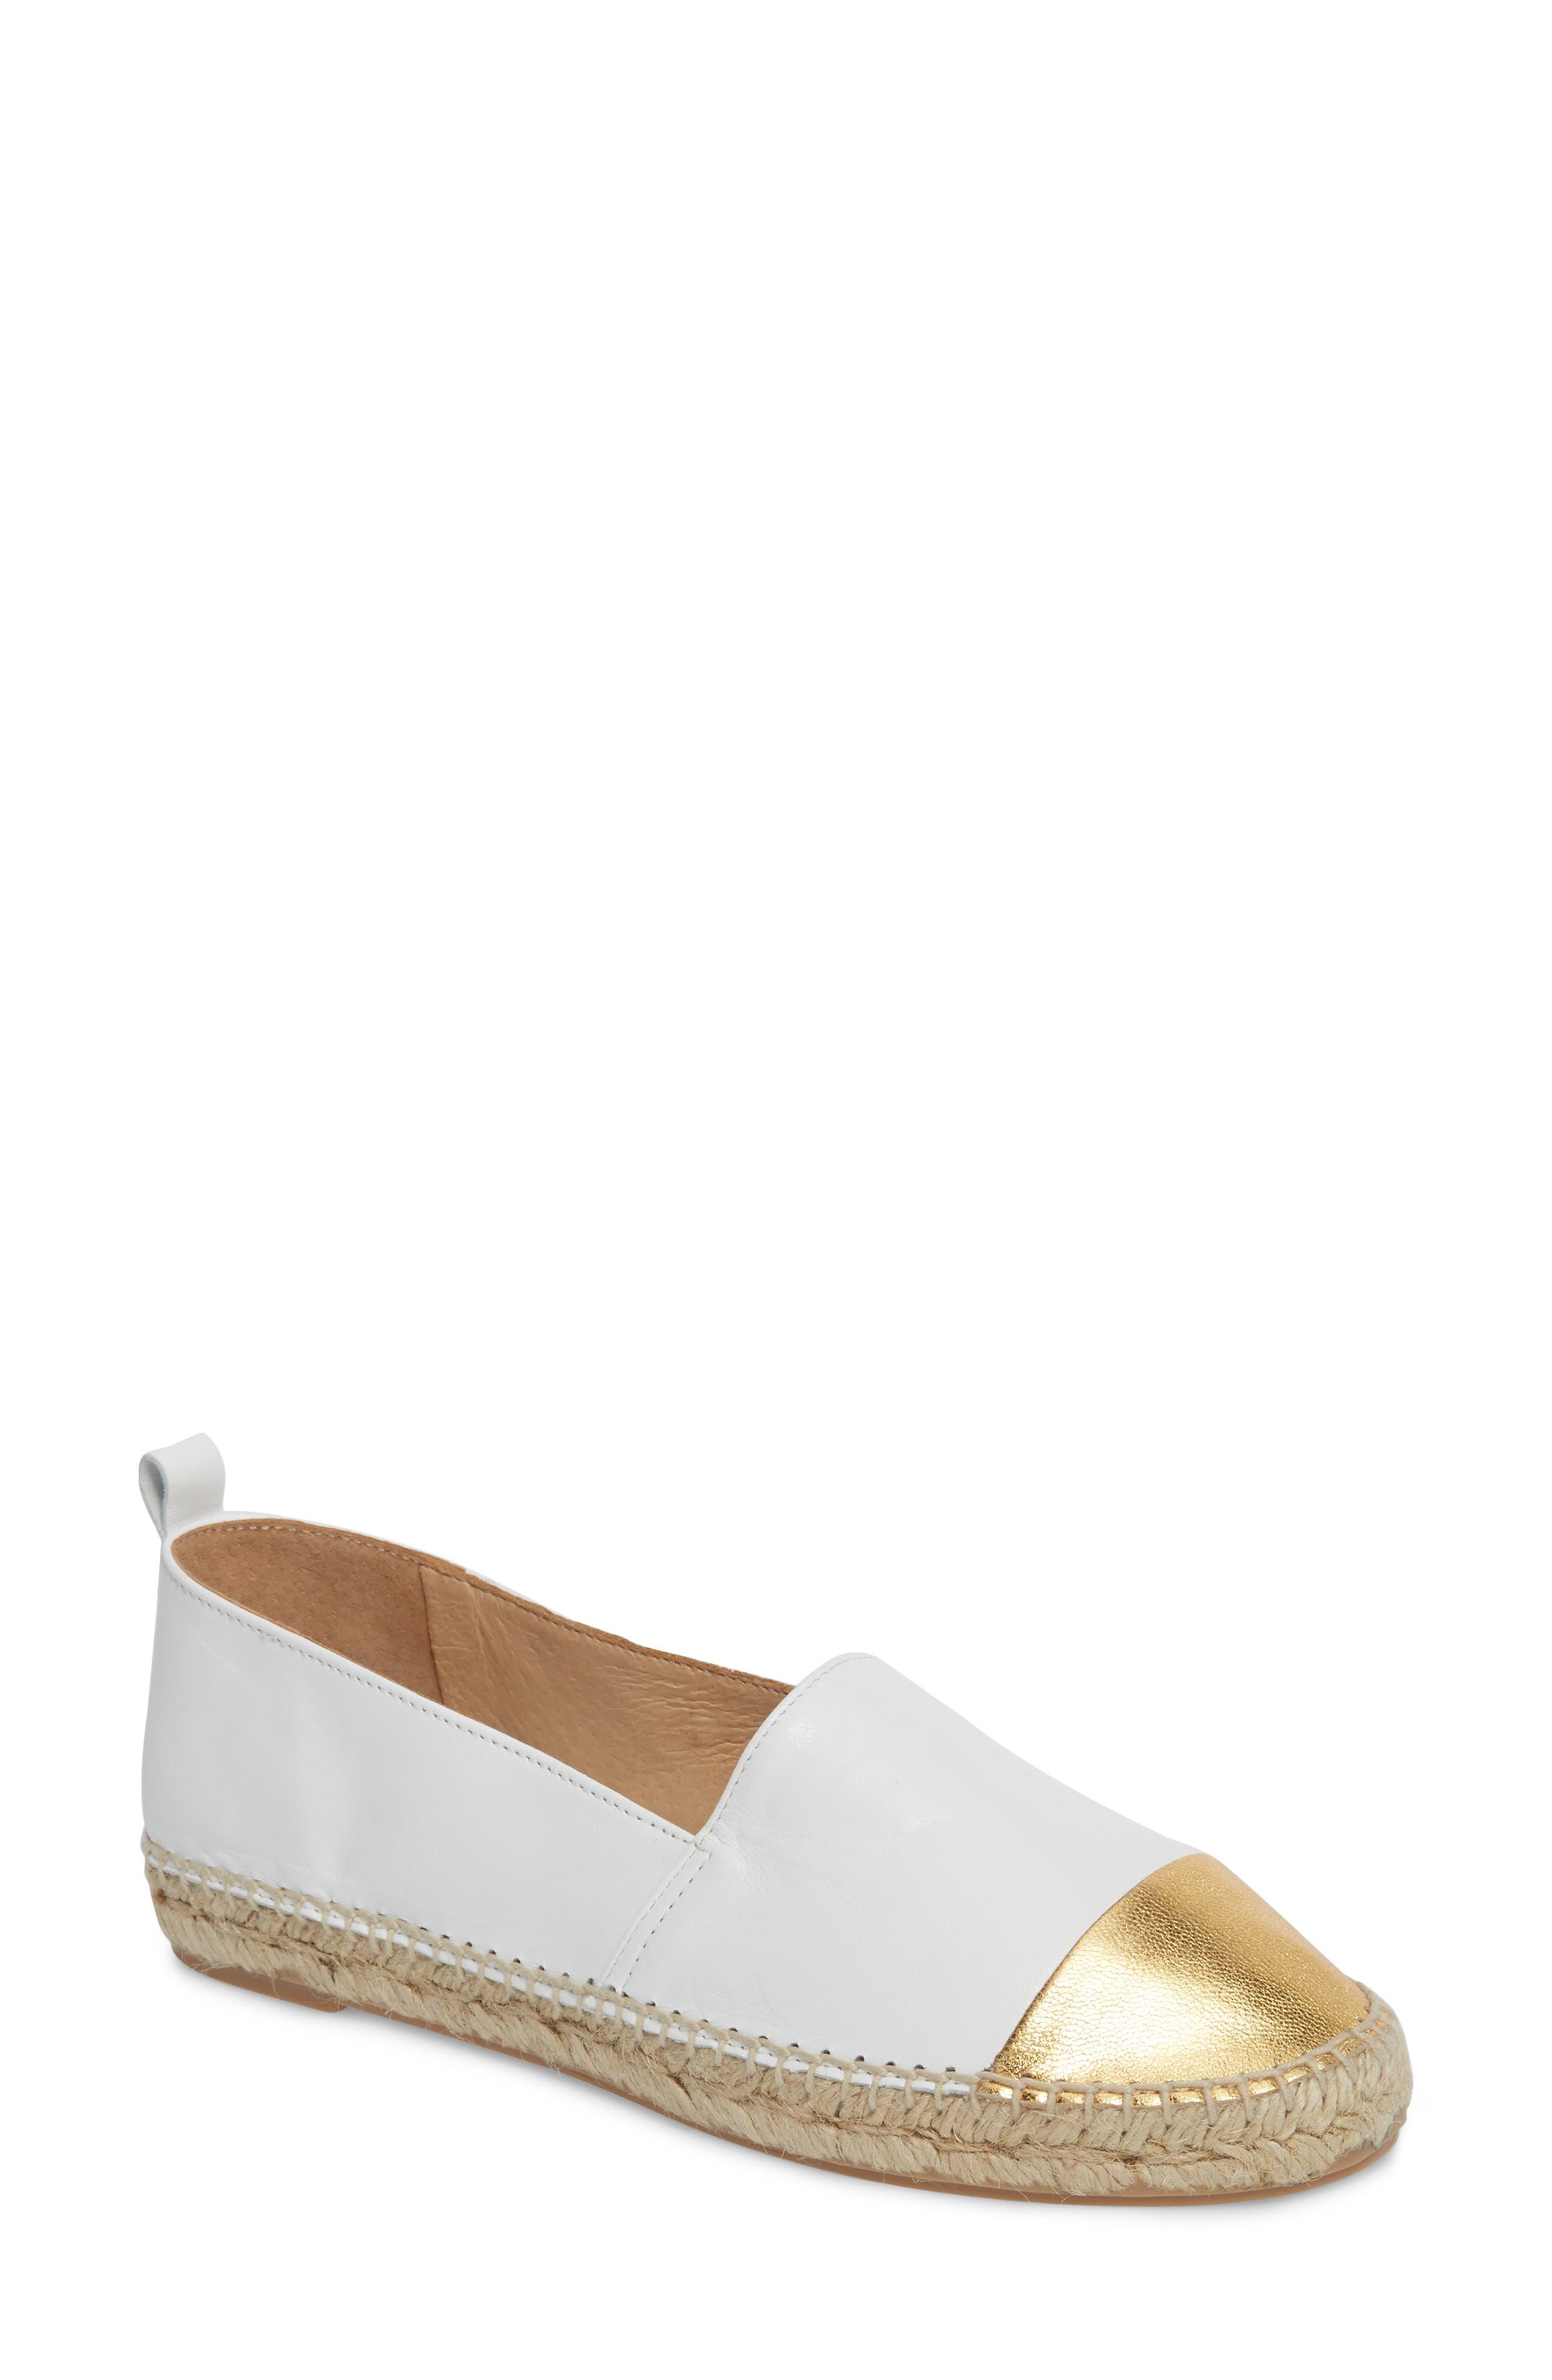 Lynn Cap Toe Espadrille,                         Main,                         color, White/ Gold Leather